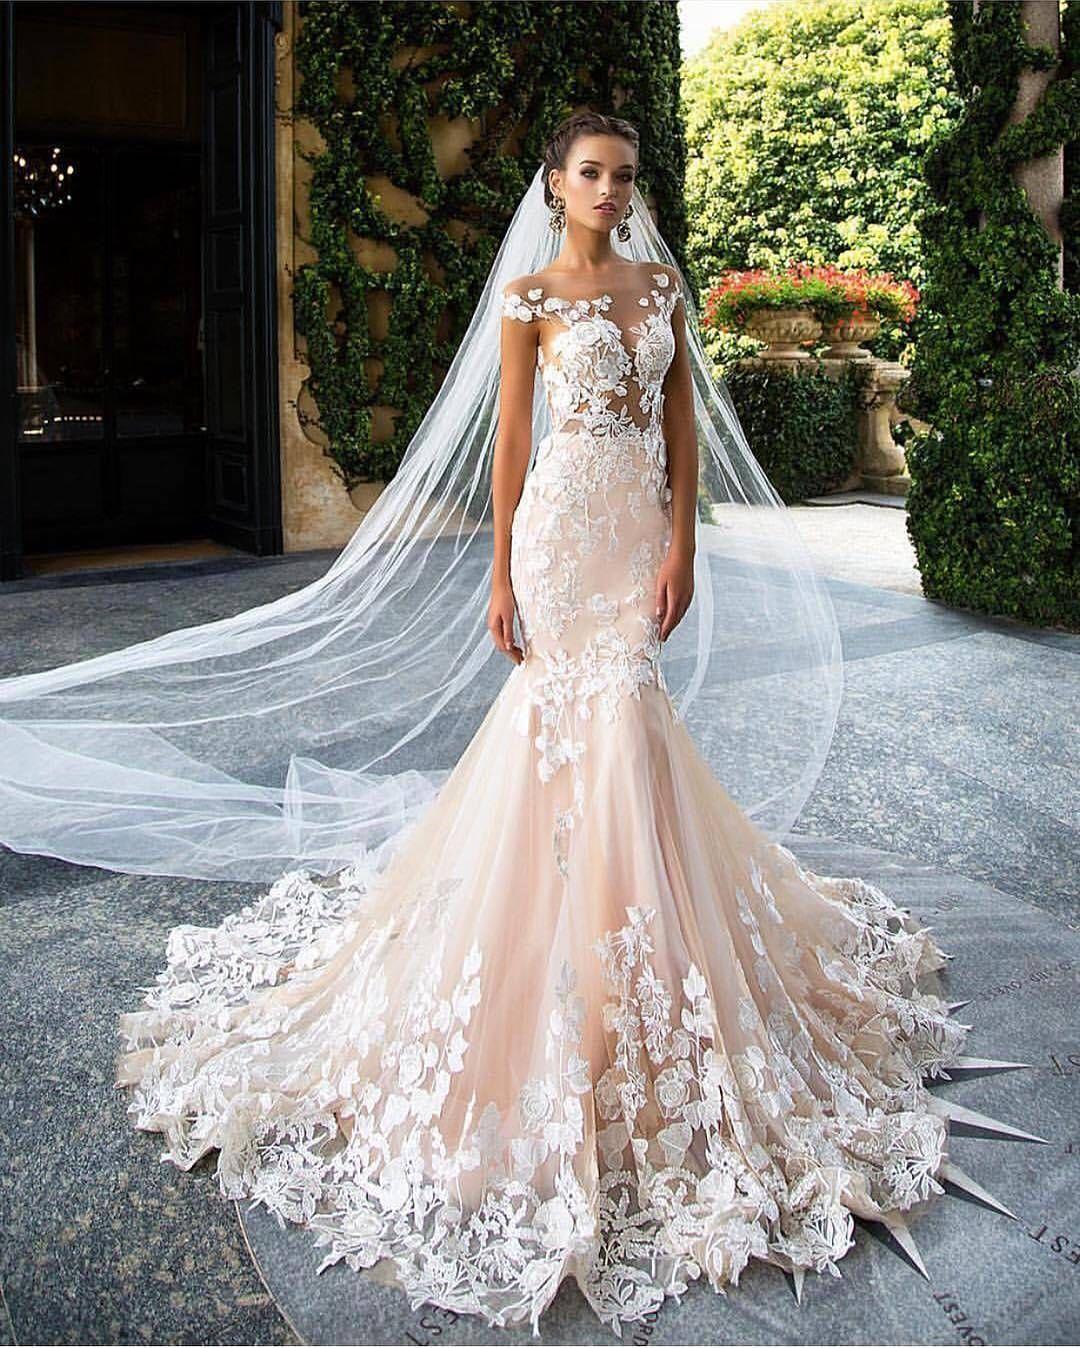 Gorgeous weddingdress from the amazing nasmoda xo